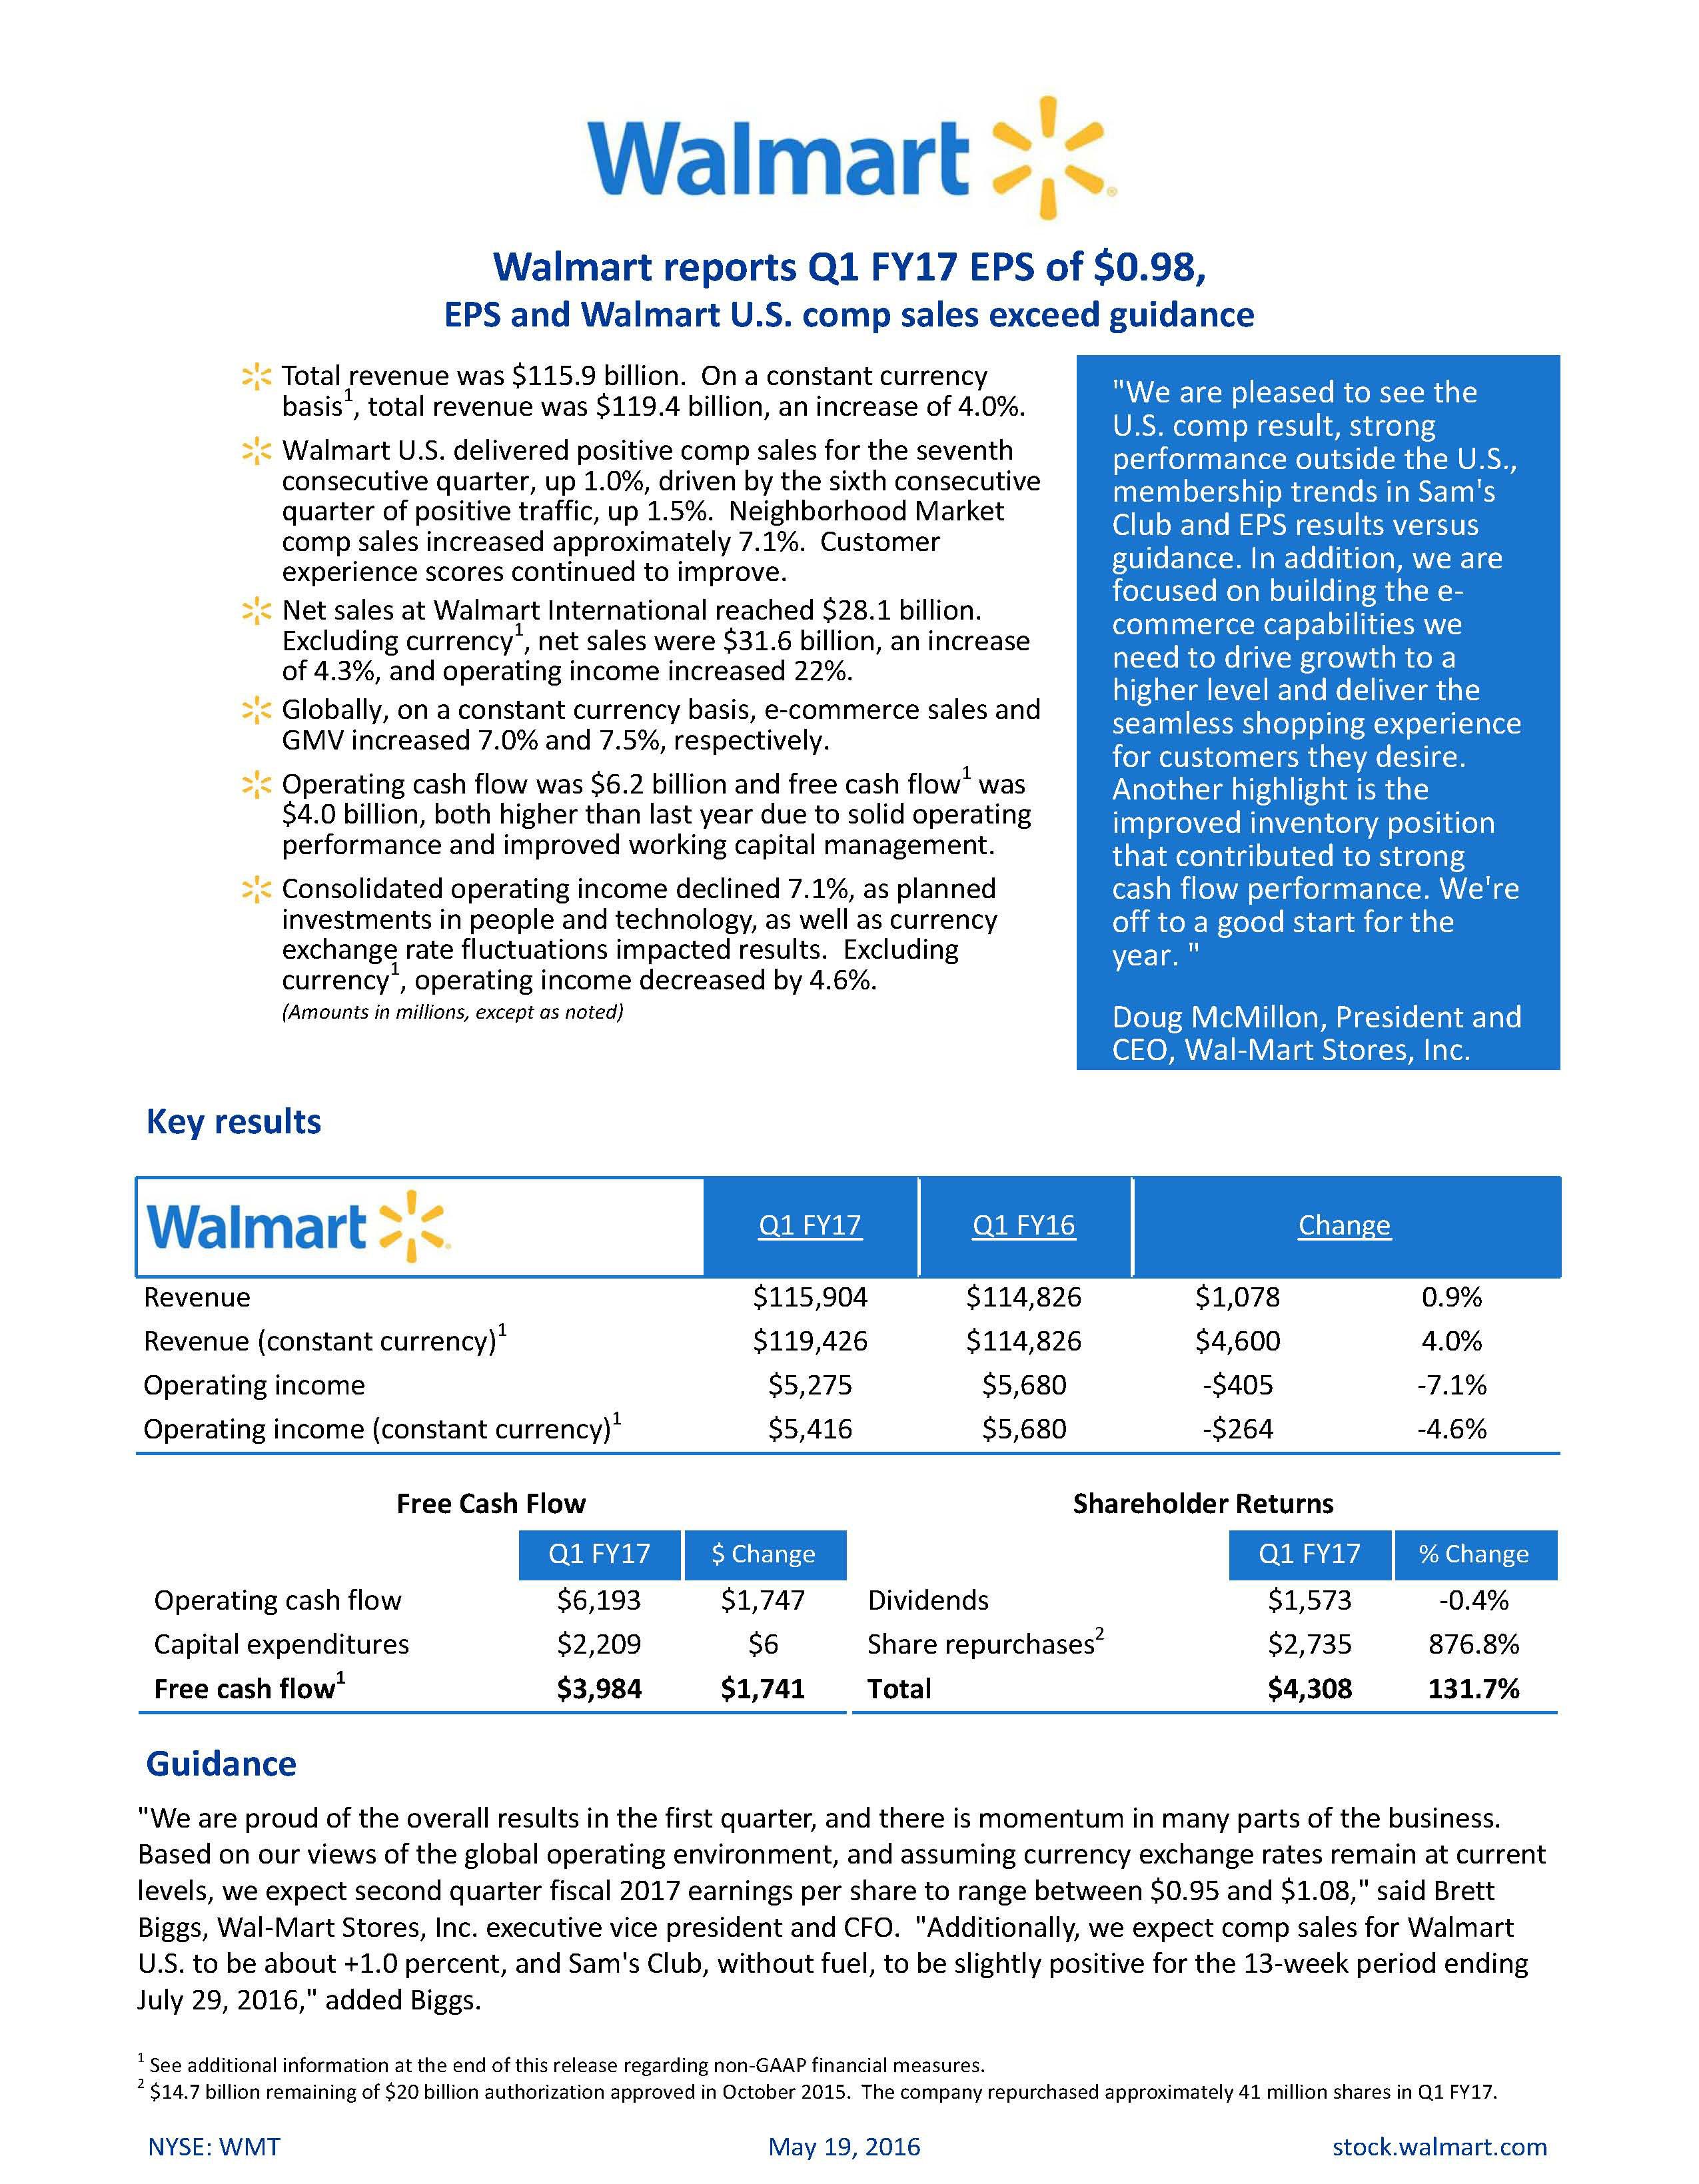 Walmart reports Q1 FY17 EPS of $0.98, EPS and Walmart U.S. comp ...